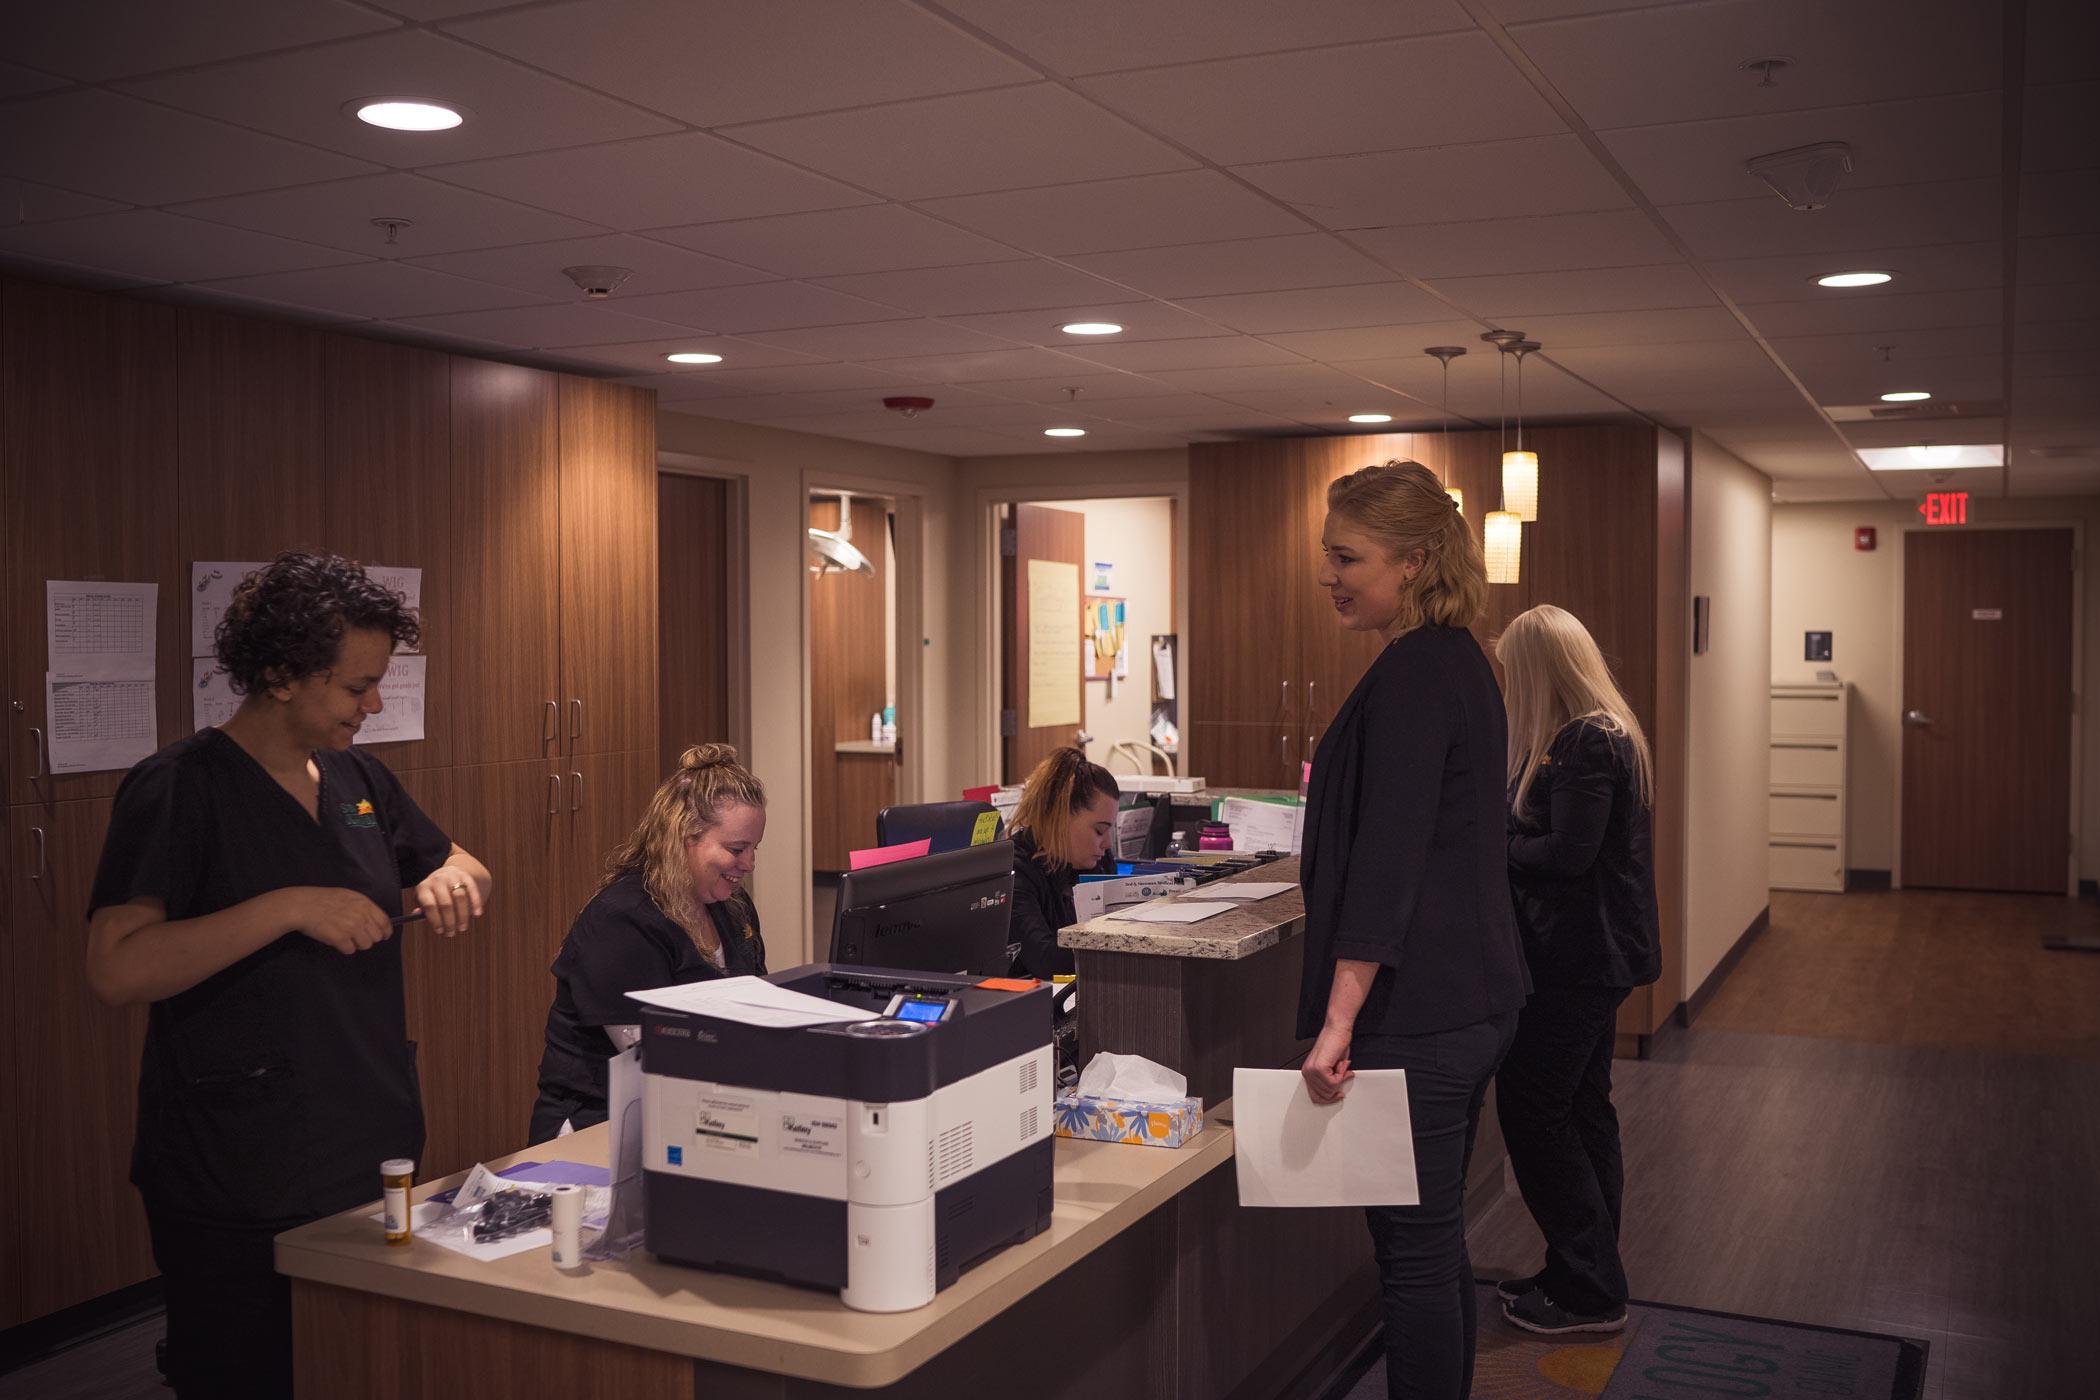 spokane-dermatology-employees-reviewing-files.jpg